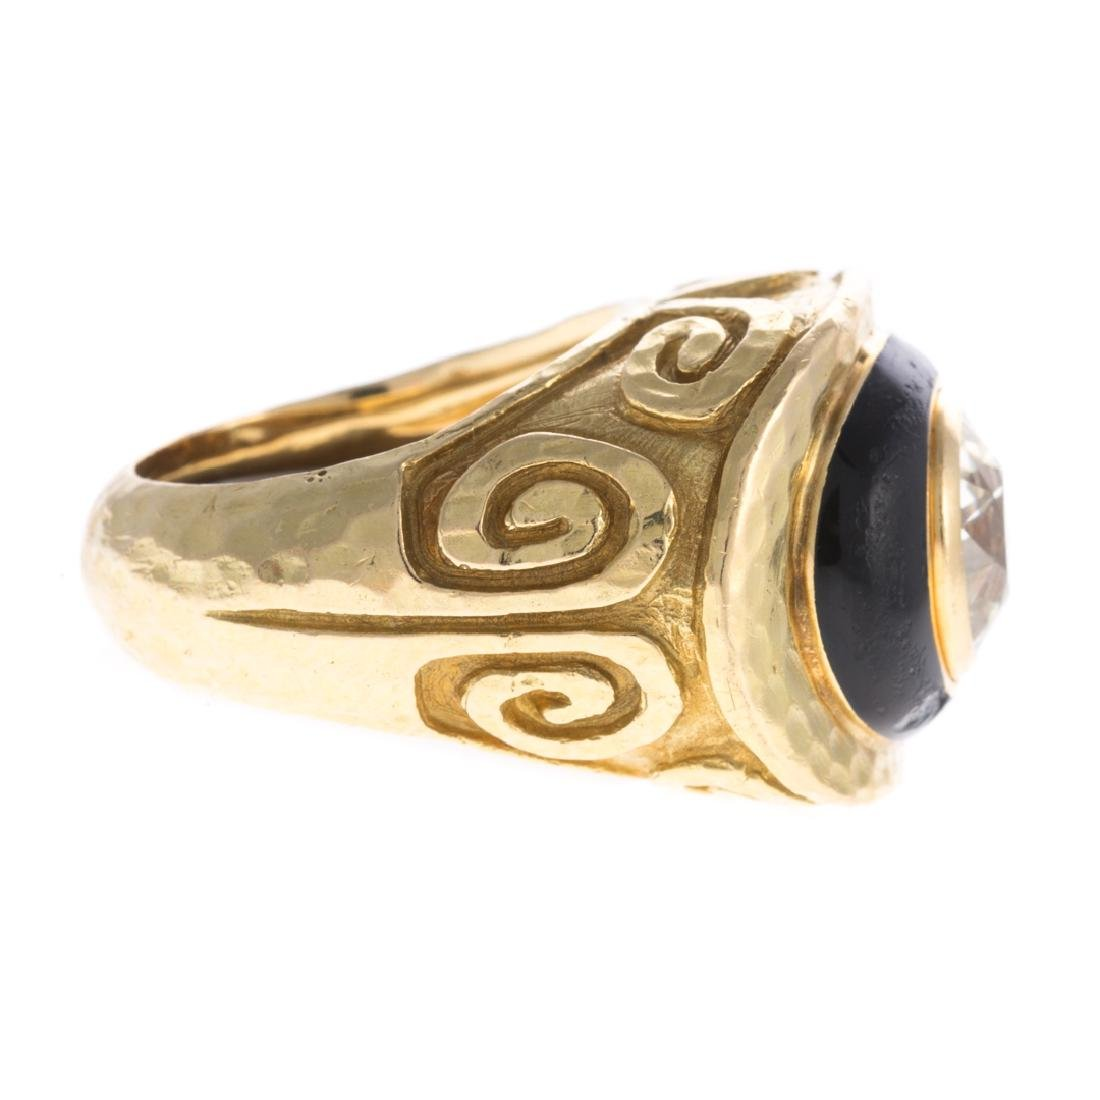 A 18K Diamond Ring & Enamel by David Webb - 3